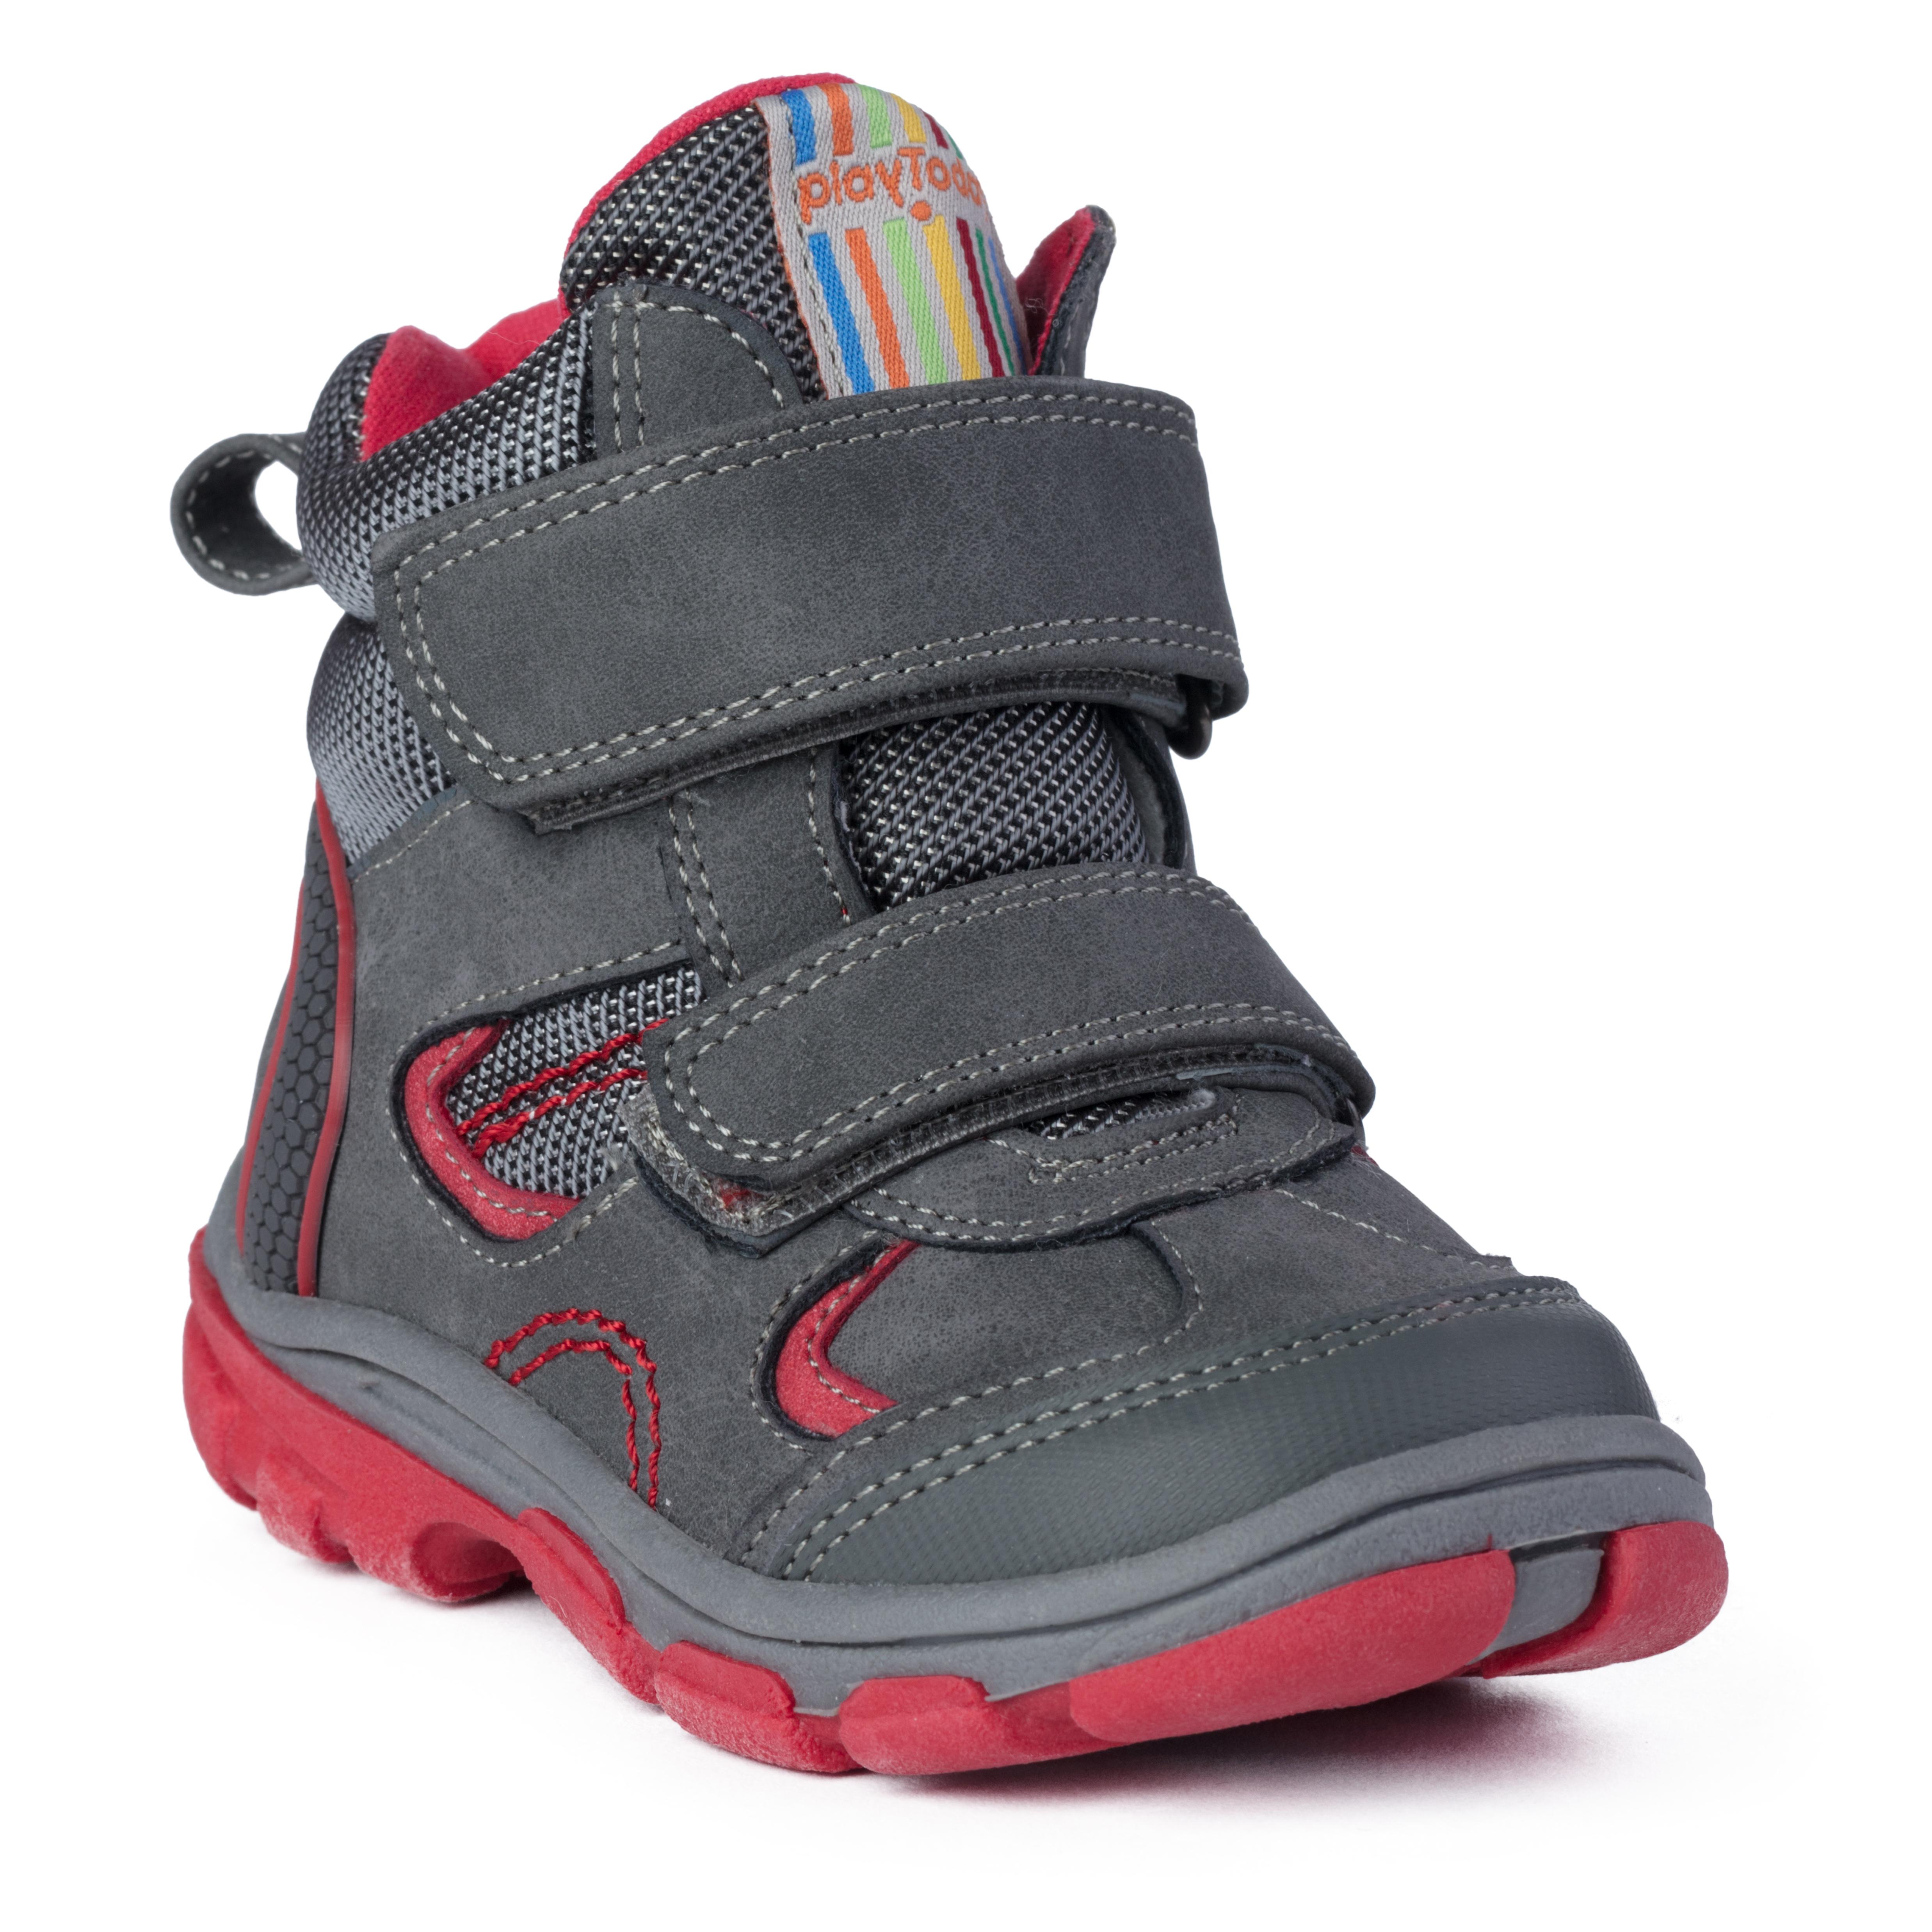 364a26a46 188224 Темно-синие ботинки для девочки PlayToday Baby PlayToday Baby ...